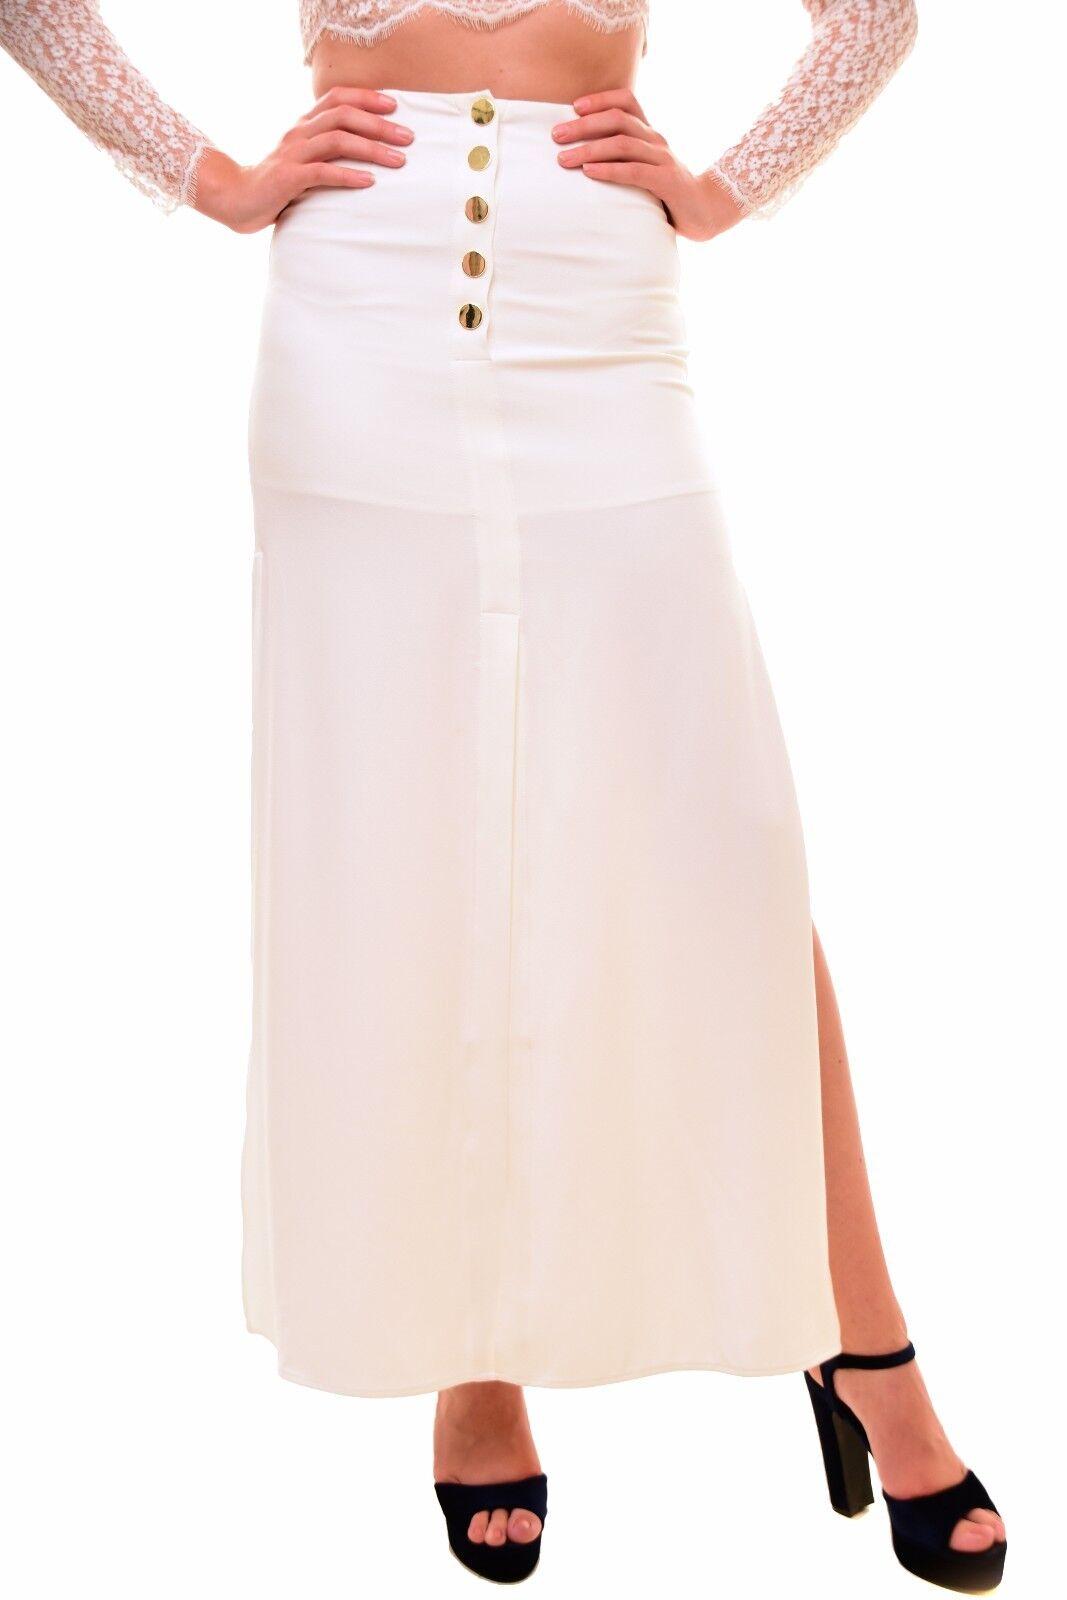 Finders Keepers Elegant Wonderful Stylish Maddox Skirt Cloud S RRP  BCF79